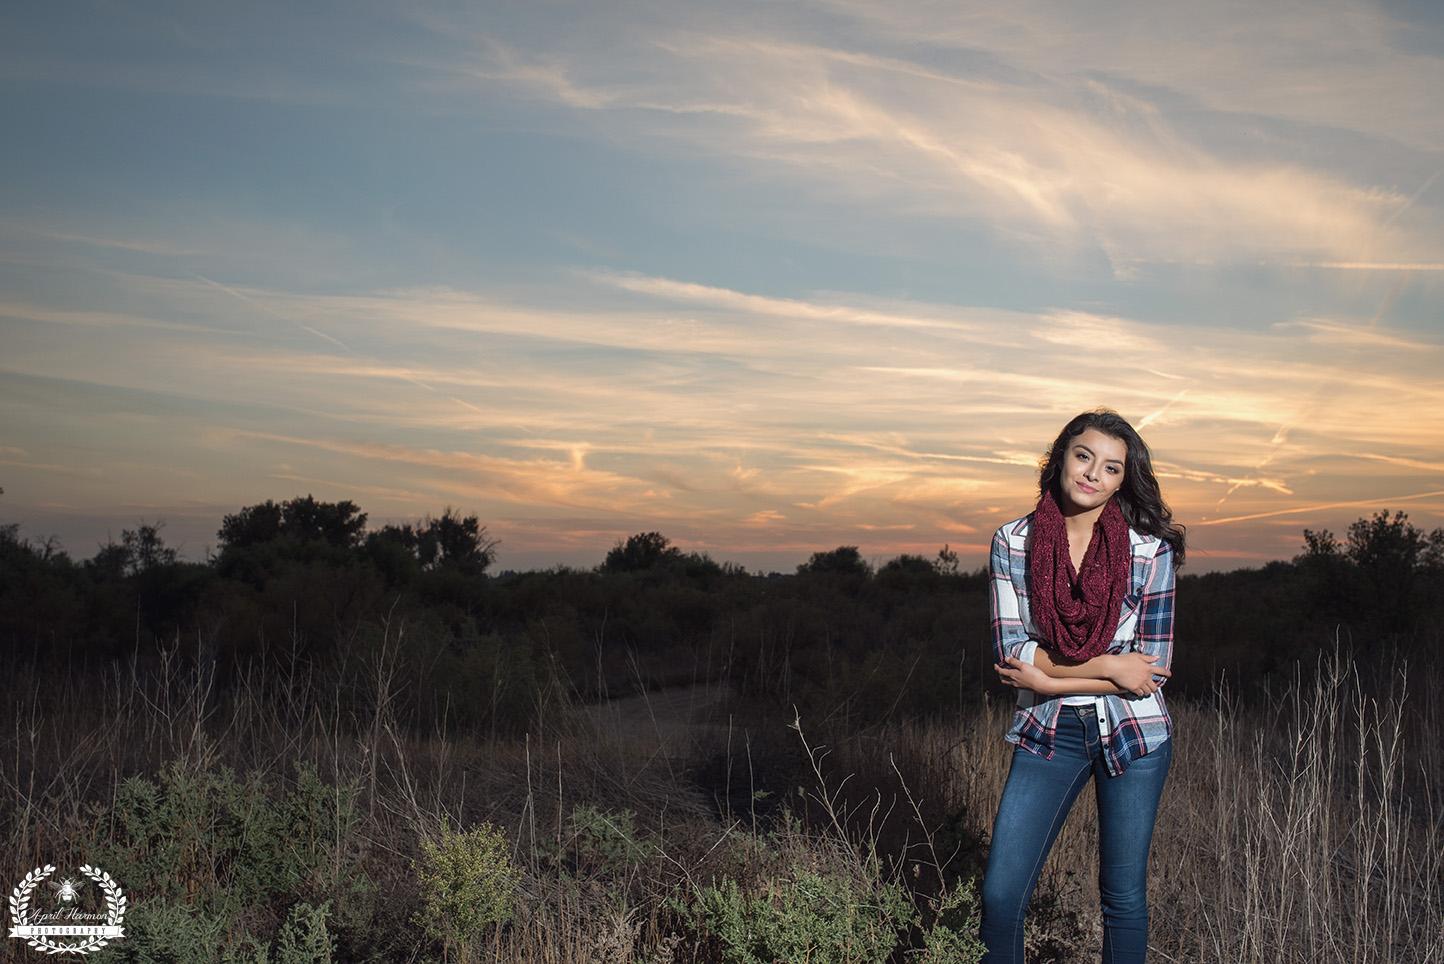 Senior-photography-southwest-ks-32.jpg